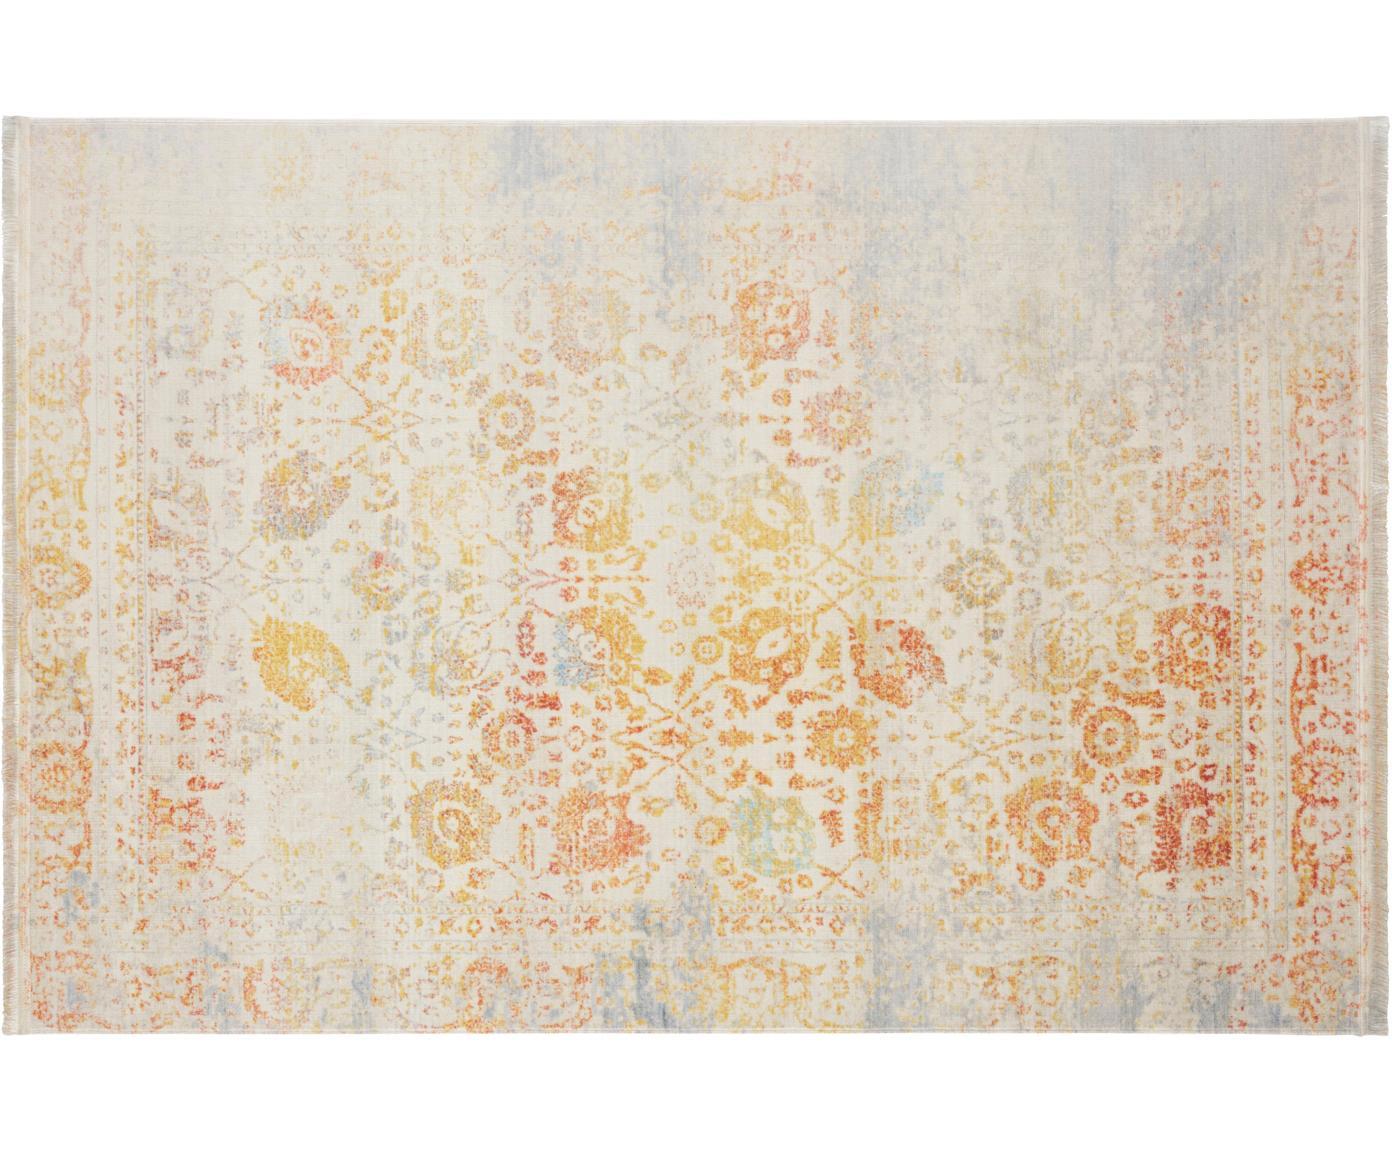 Vintage Teppich Menga mit bunten Ornamenten, Flor: 60%Polyester, 40%Baumwo, Mehrfarbig, B 120 x L 180 cm (Grösse S)